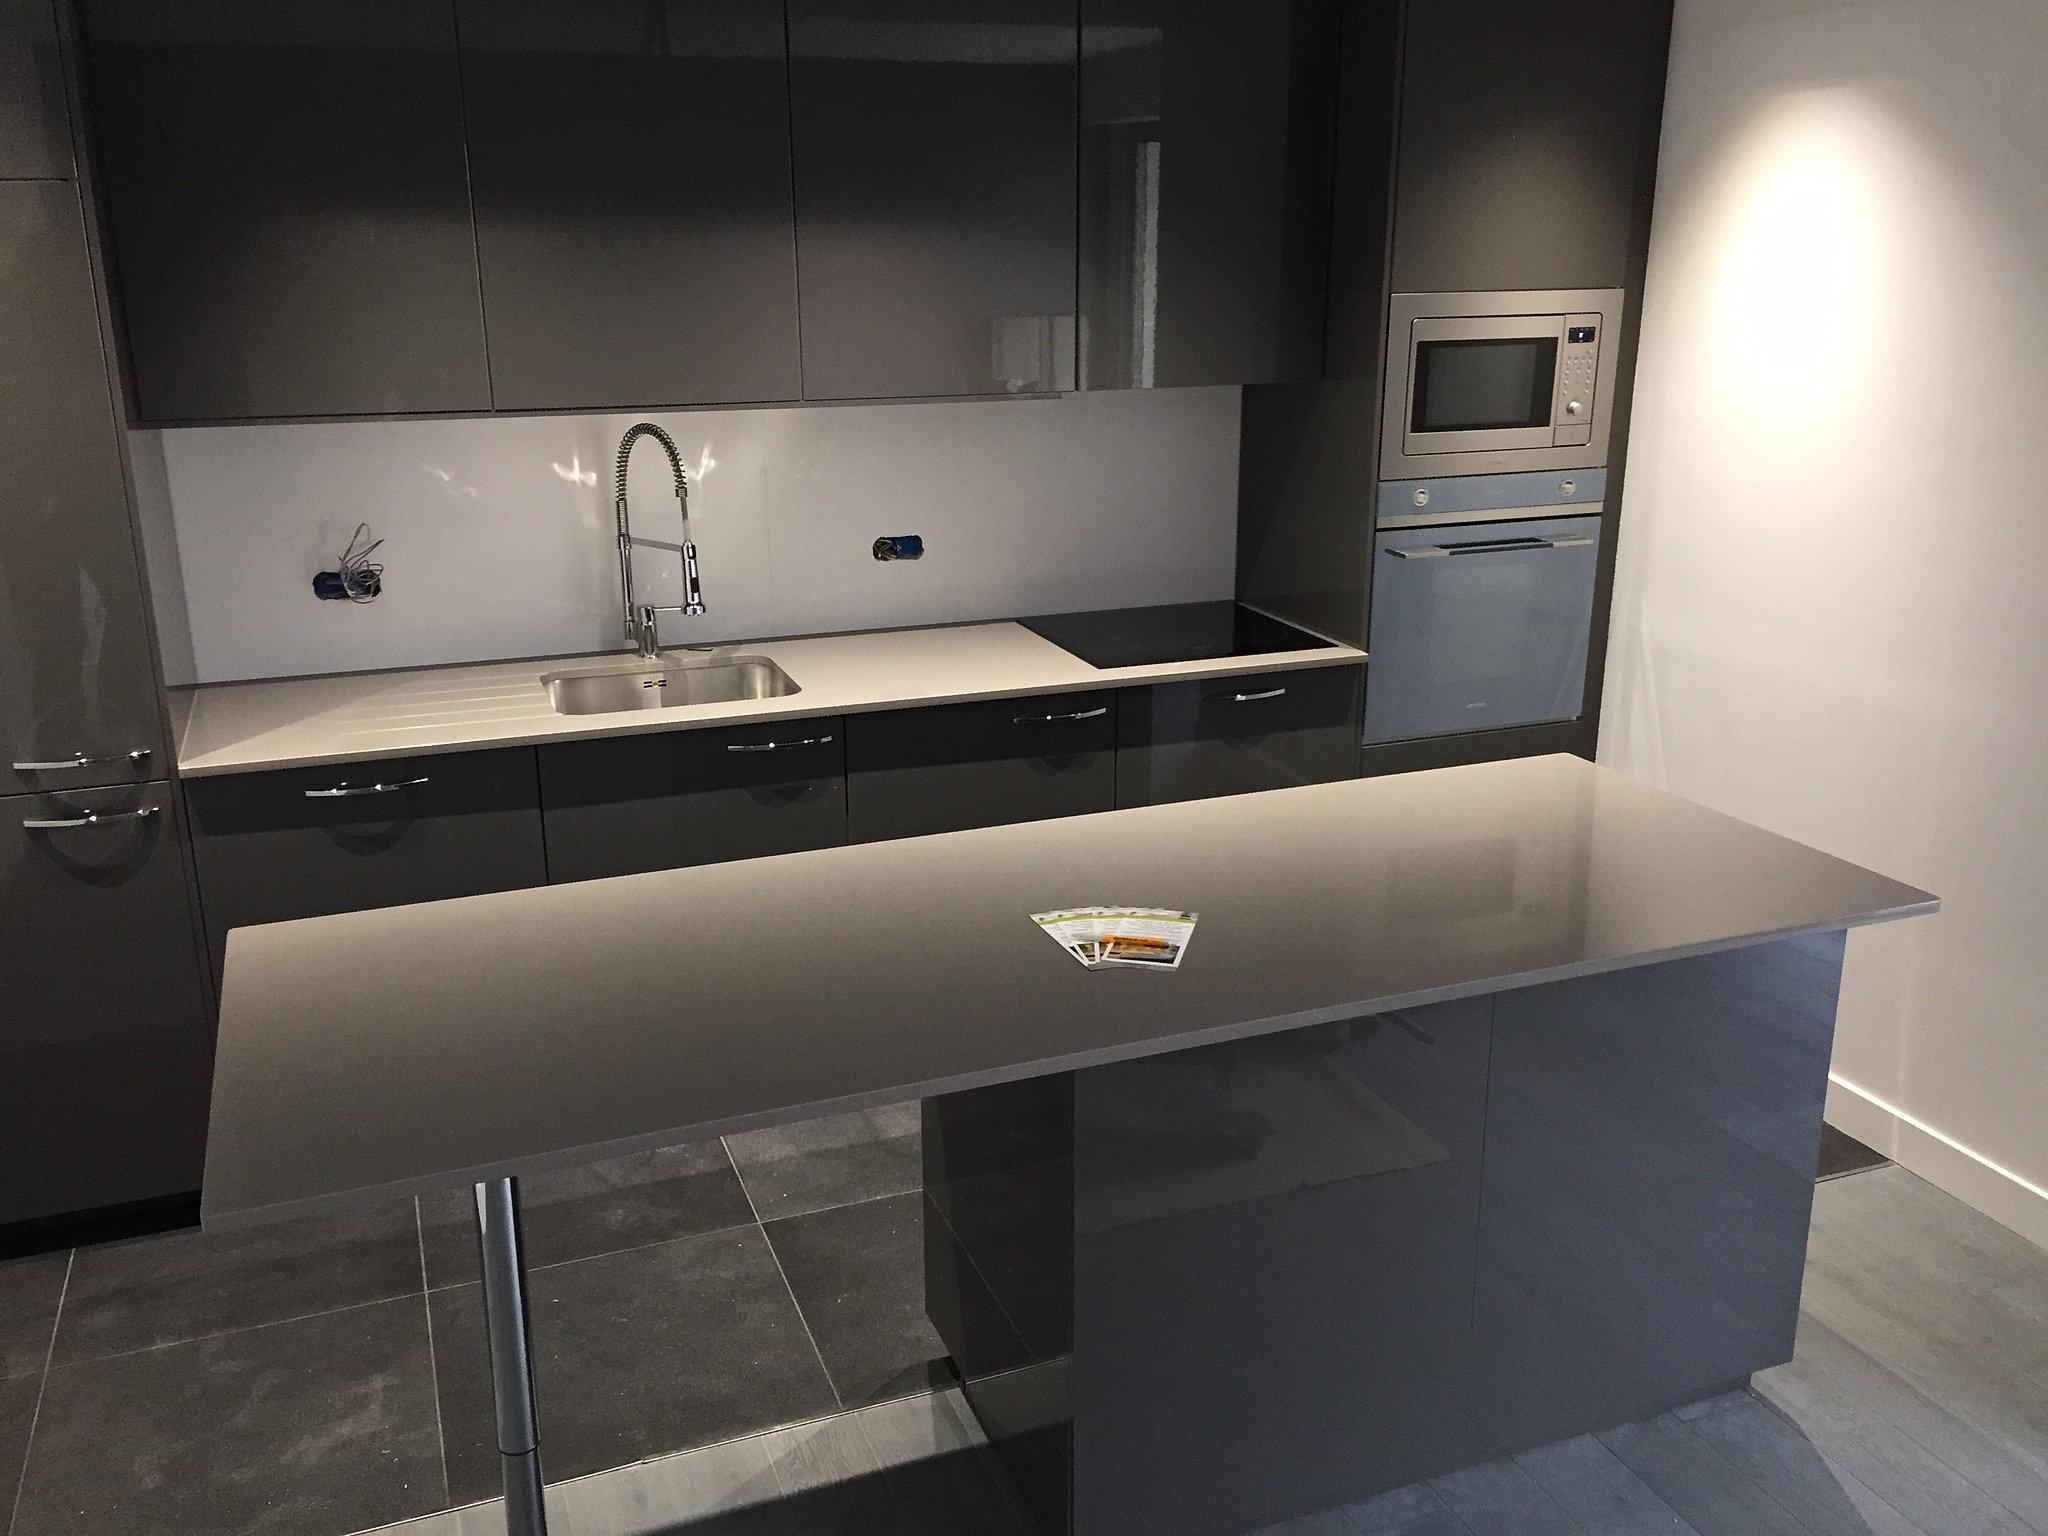 devis plan de travail com paris granit quartz marbre quartz silestone. Black Bedroom Furniture Sets. Home Design Ideas